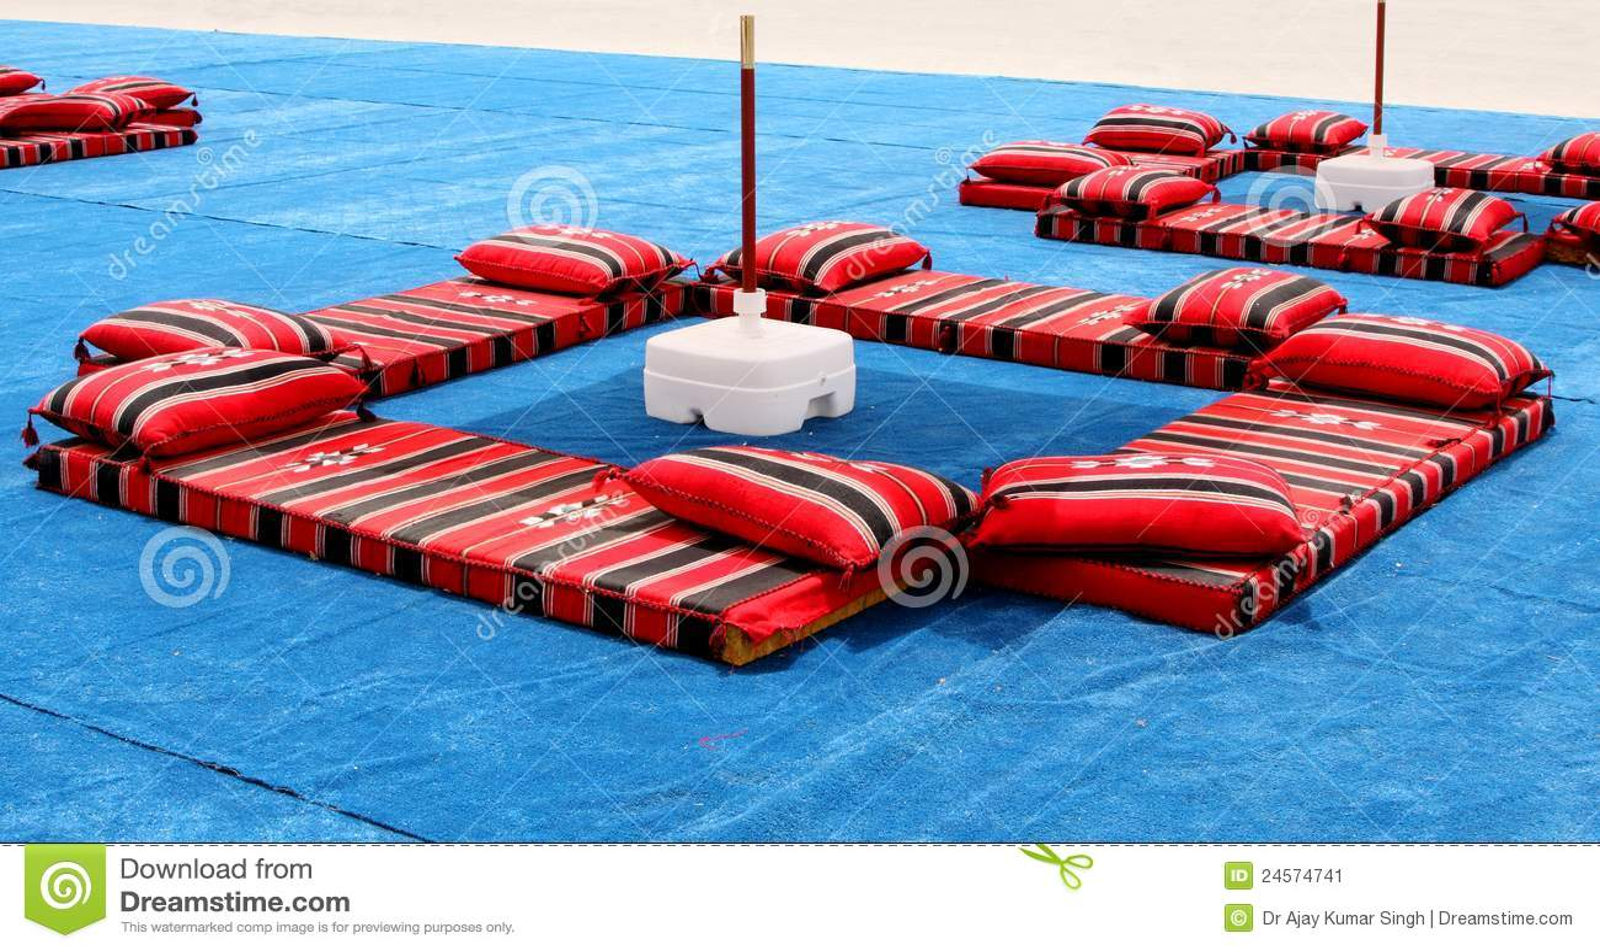 Majlis, Traditional Colourful Arabian Seating Stock Image - Image: 24574741